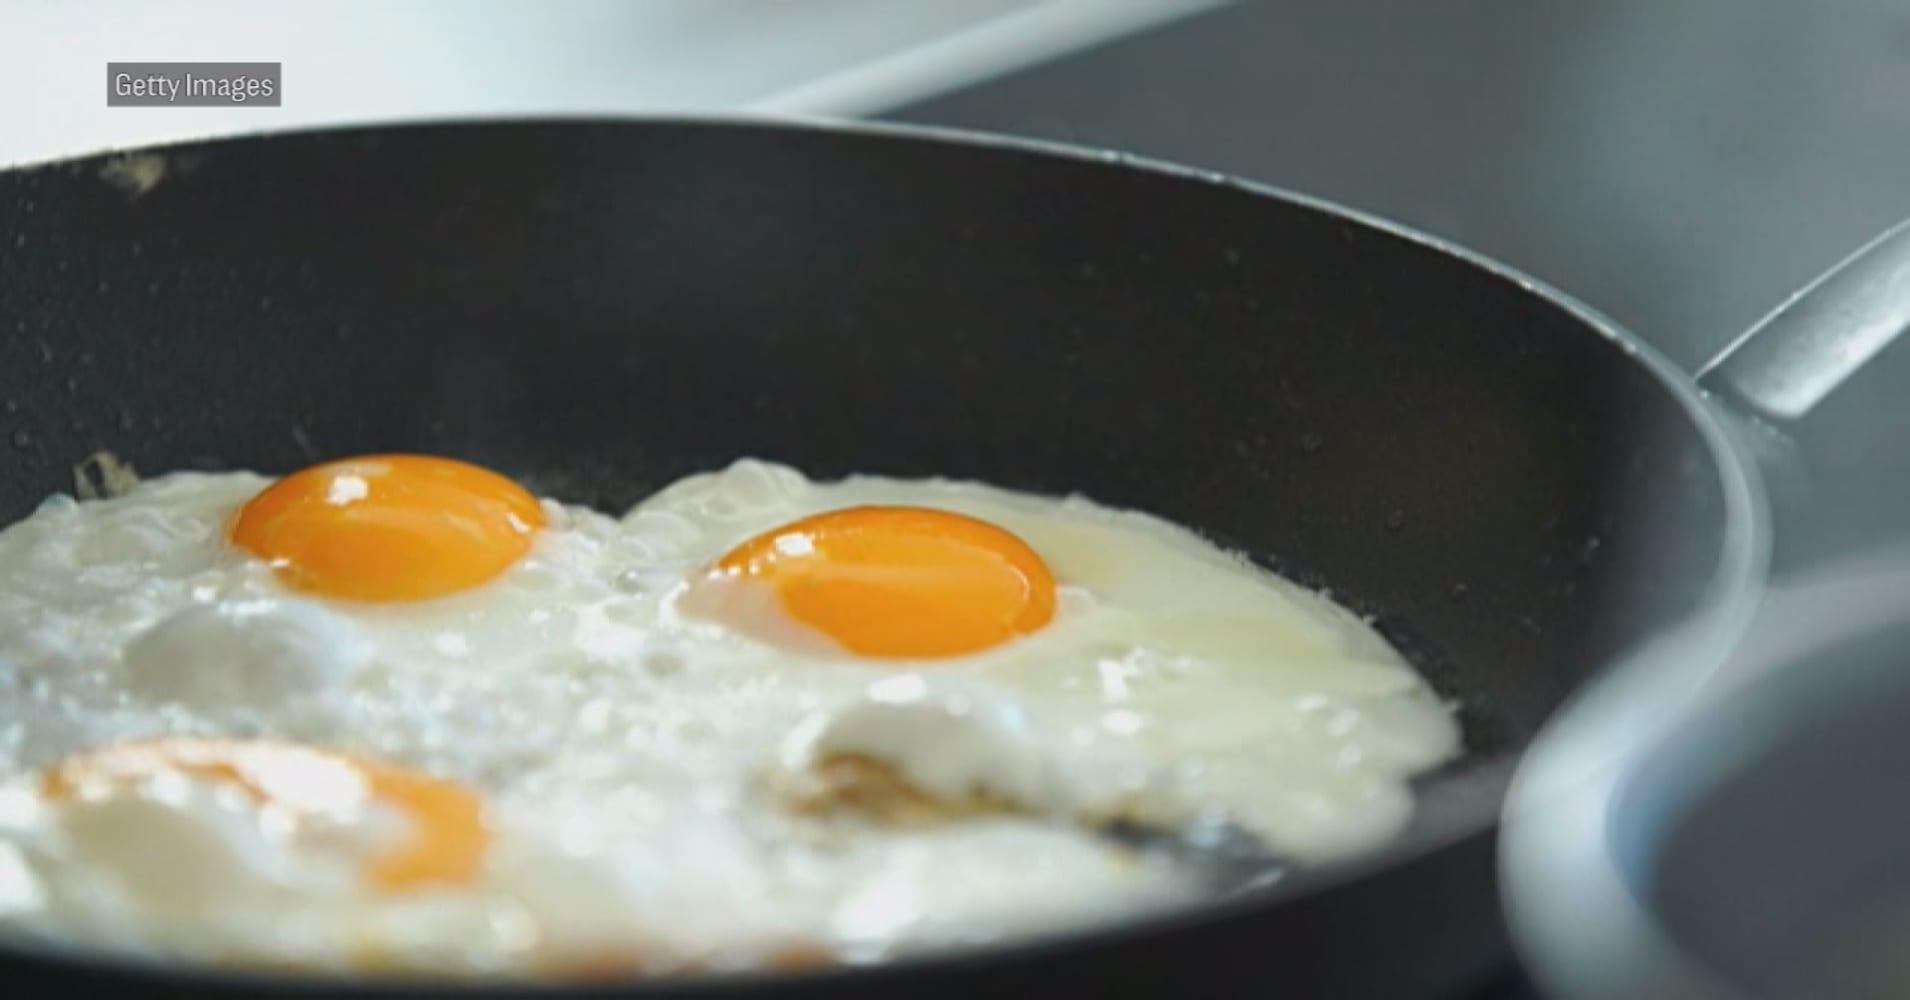 Egglands Best Recall 2020 US recalls over 200 million eggs amid salmonella fears